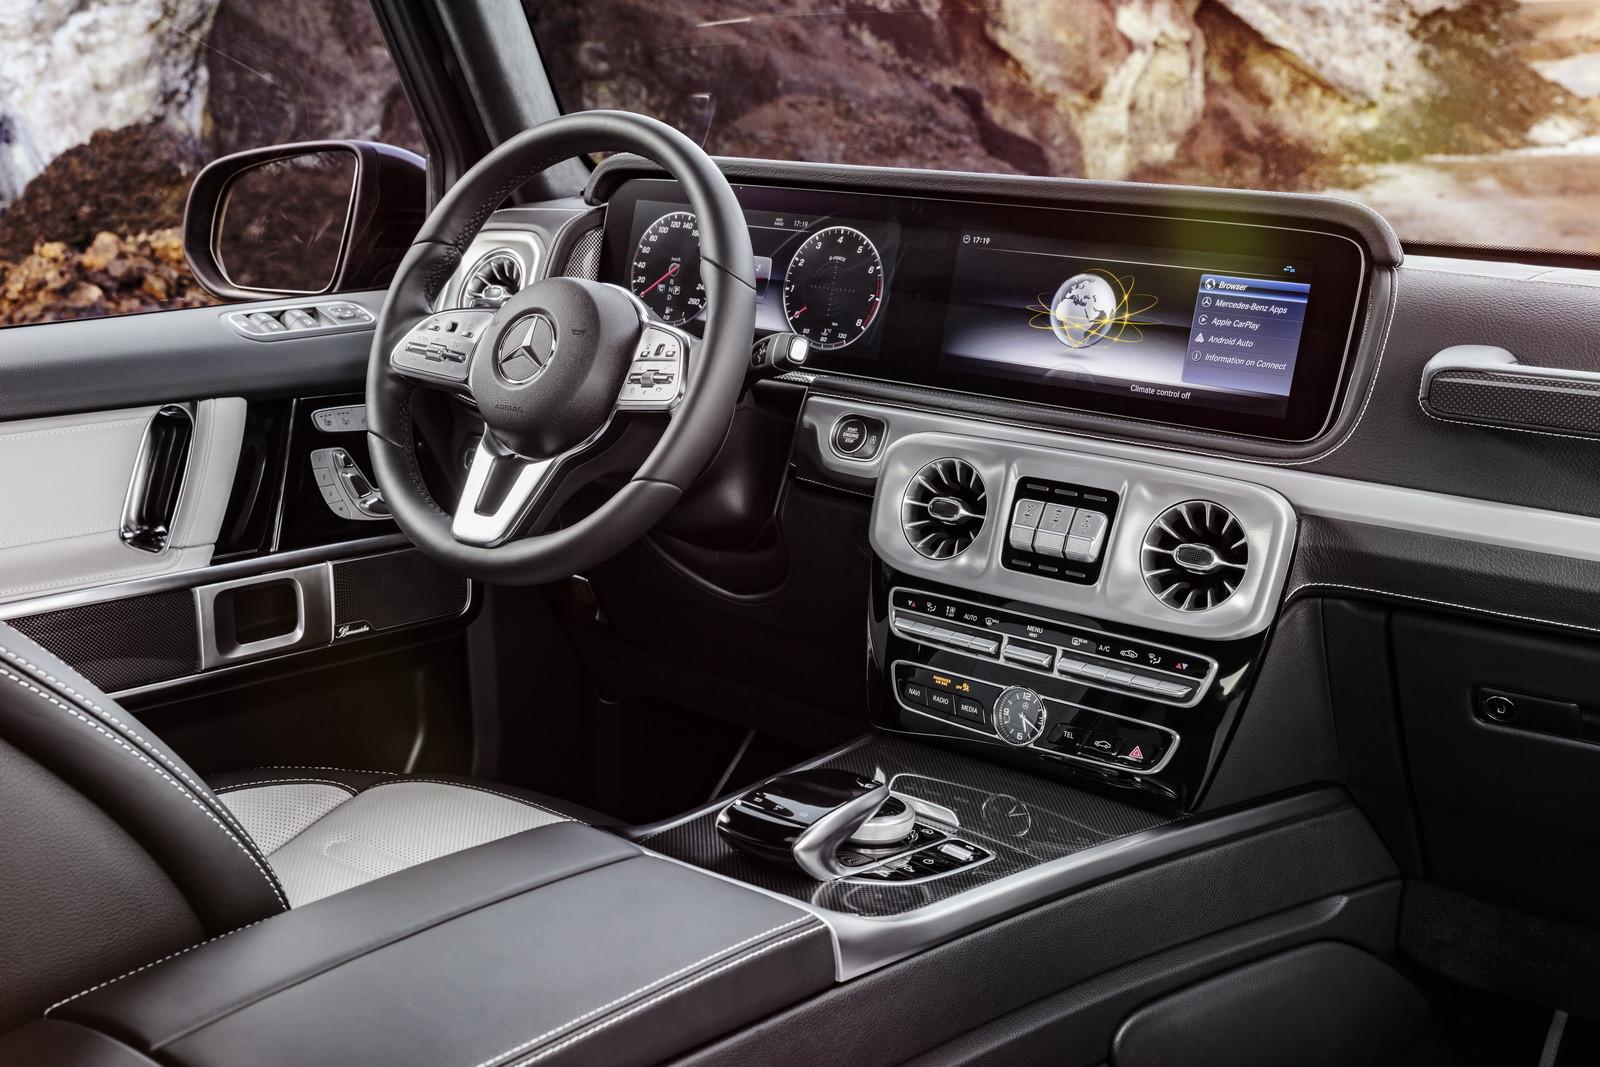 Foto de Mercedes-Benz Clase G 2018, imágenes filtradas (11/24)